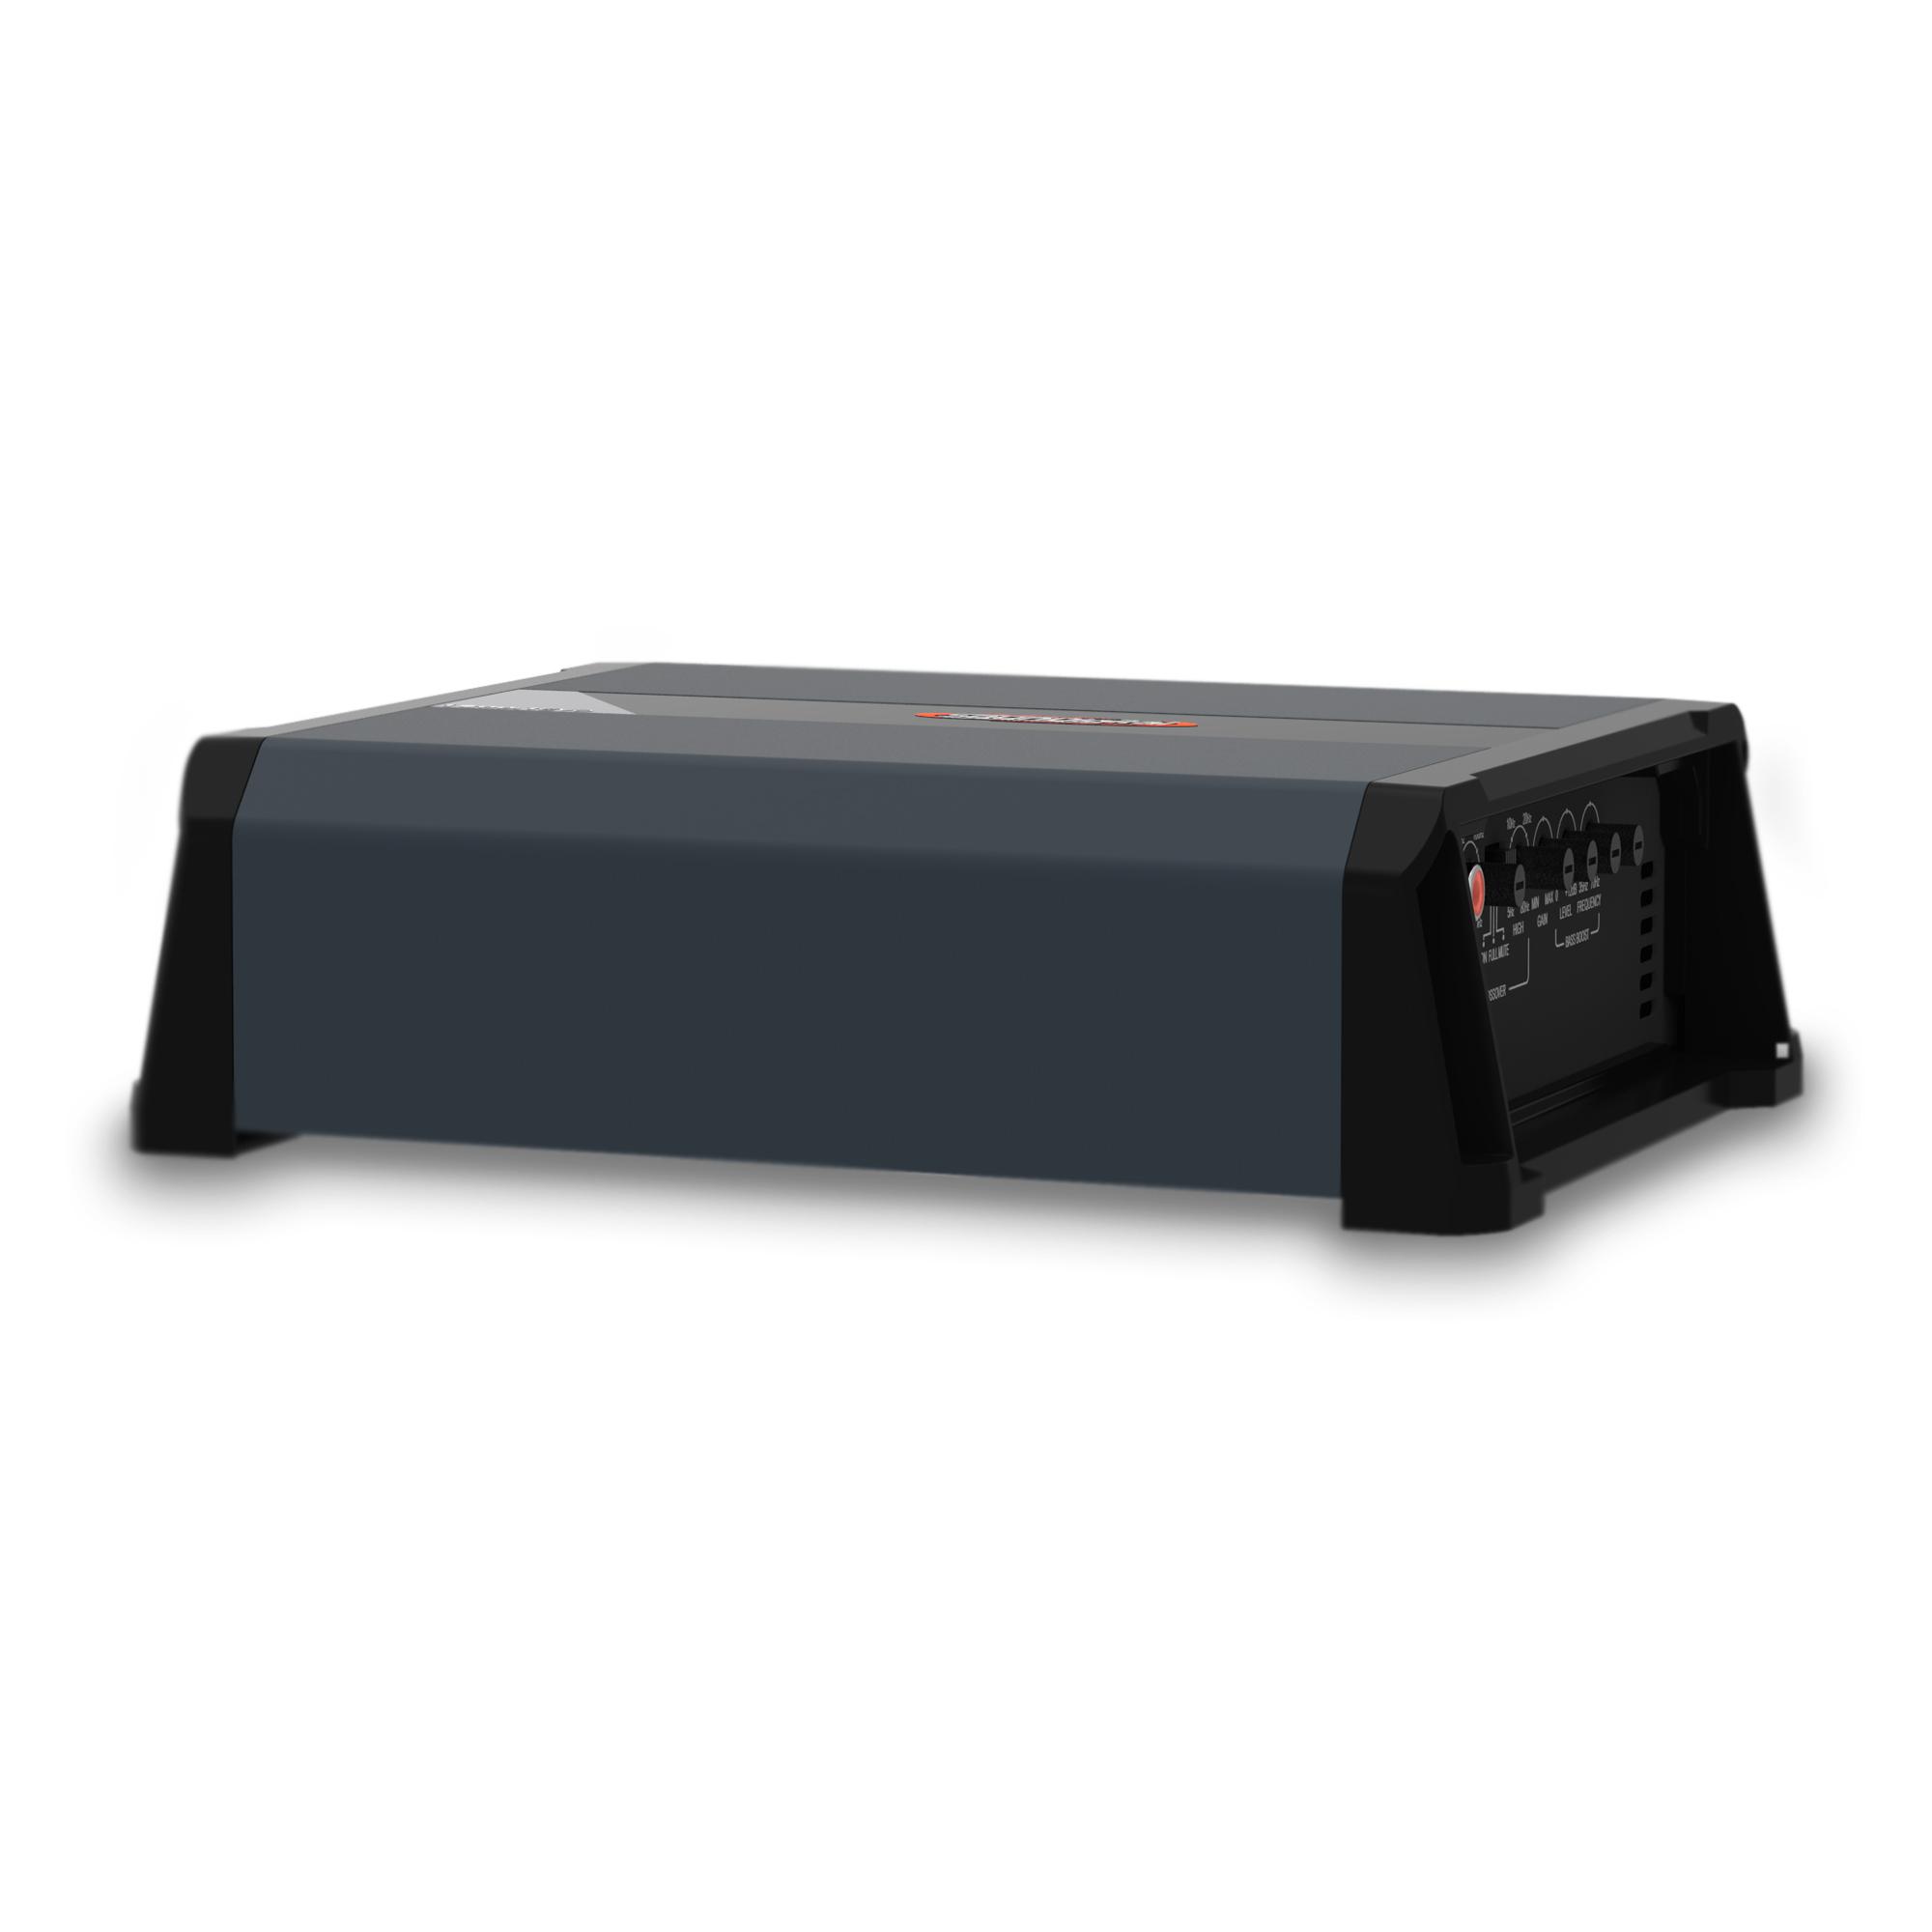 Soundigital SD1600.1 EVO 4.0 4Ohm amplificador mono - 1600W